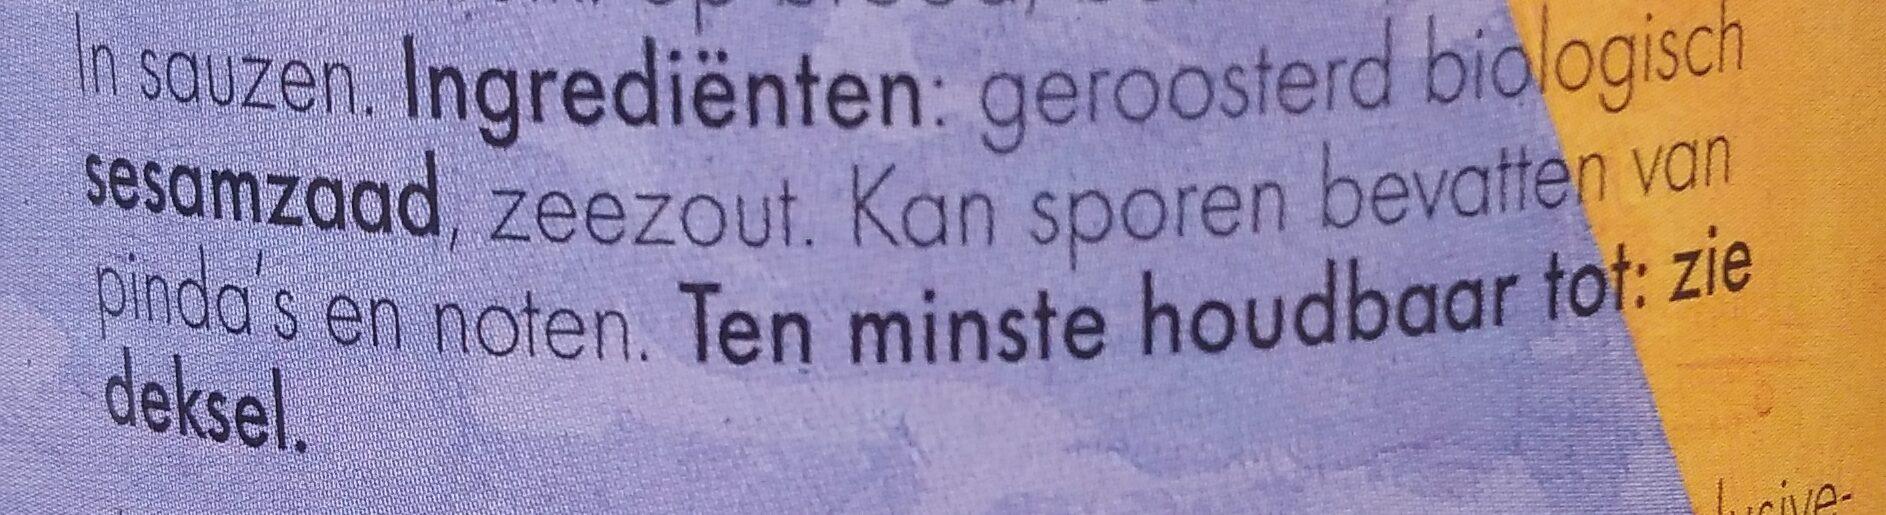 Tahin - Ingredients - nl